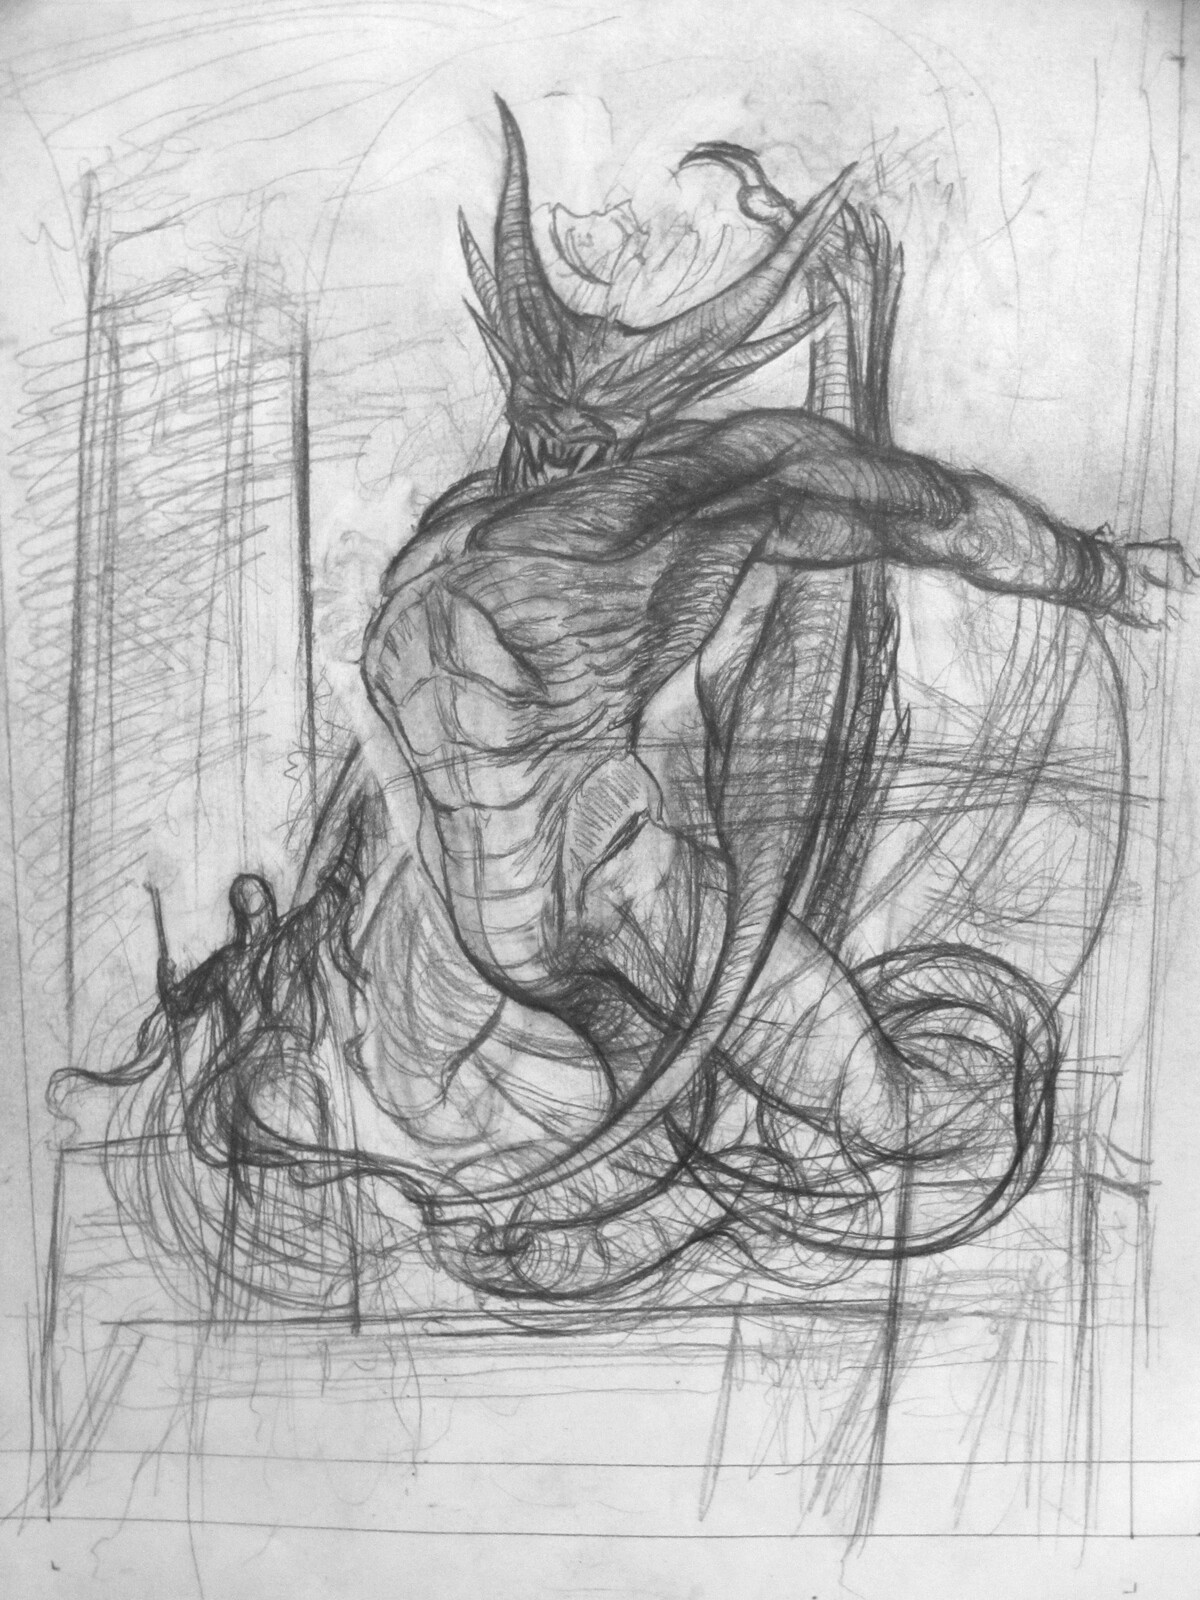 initial sketch/alternate pose